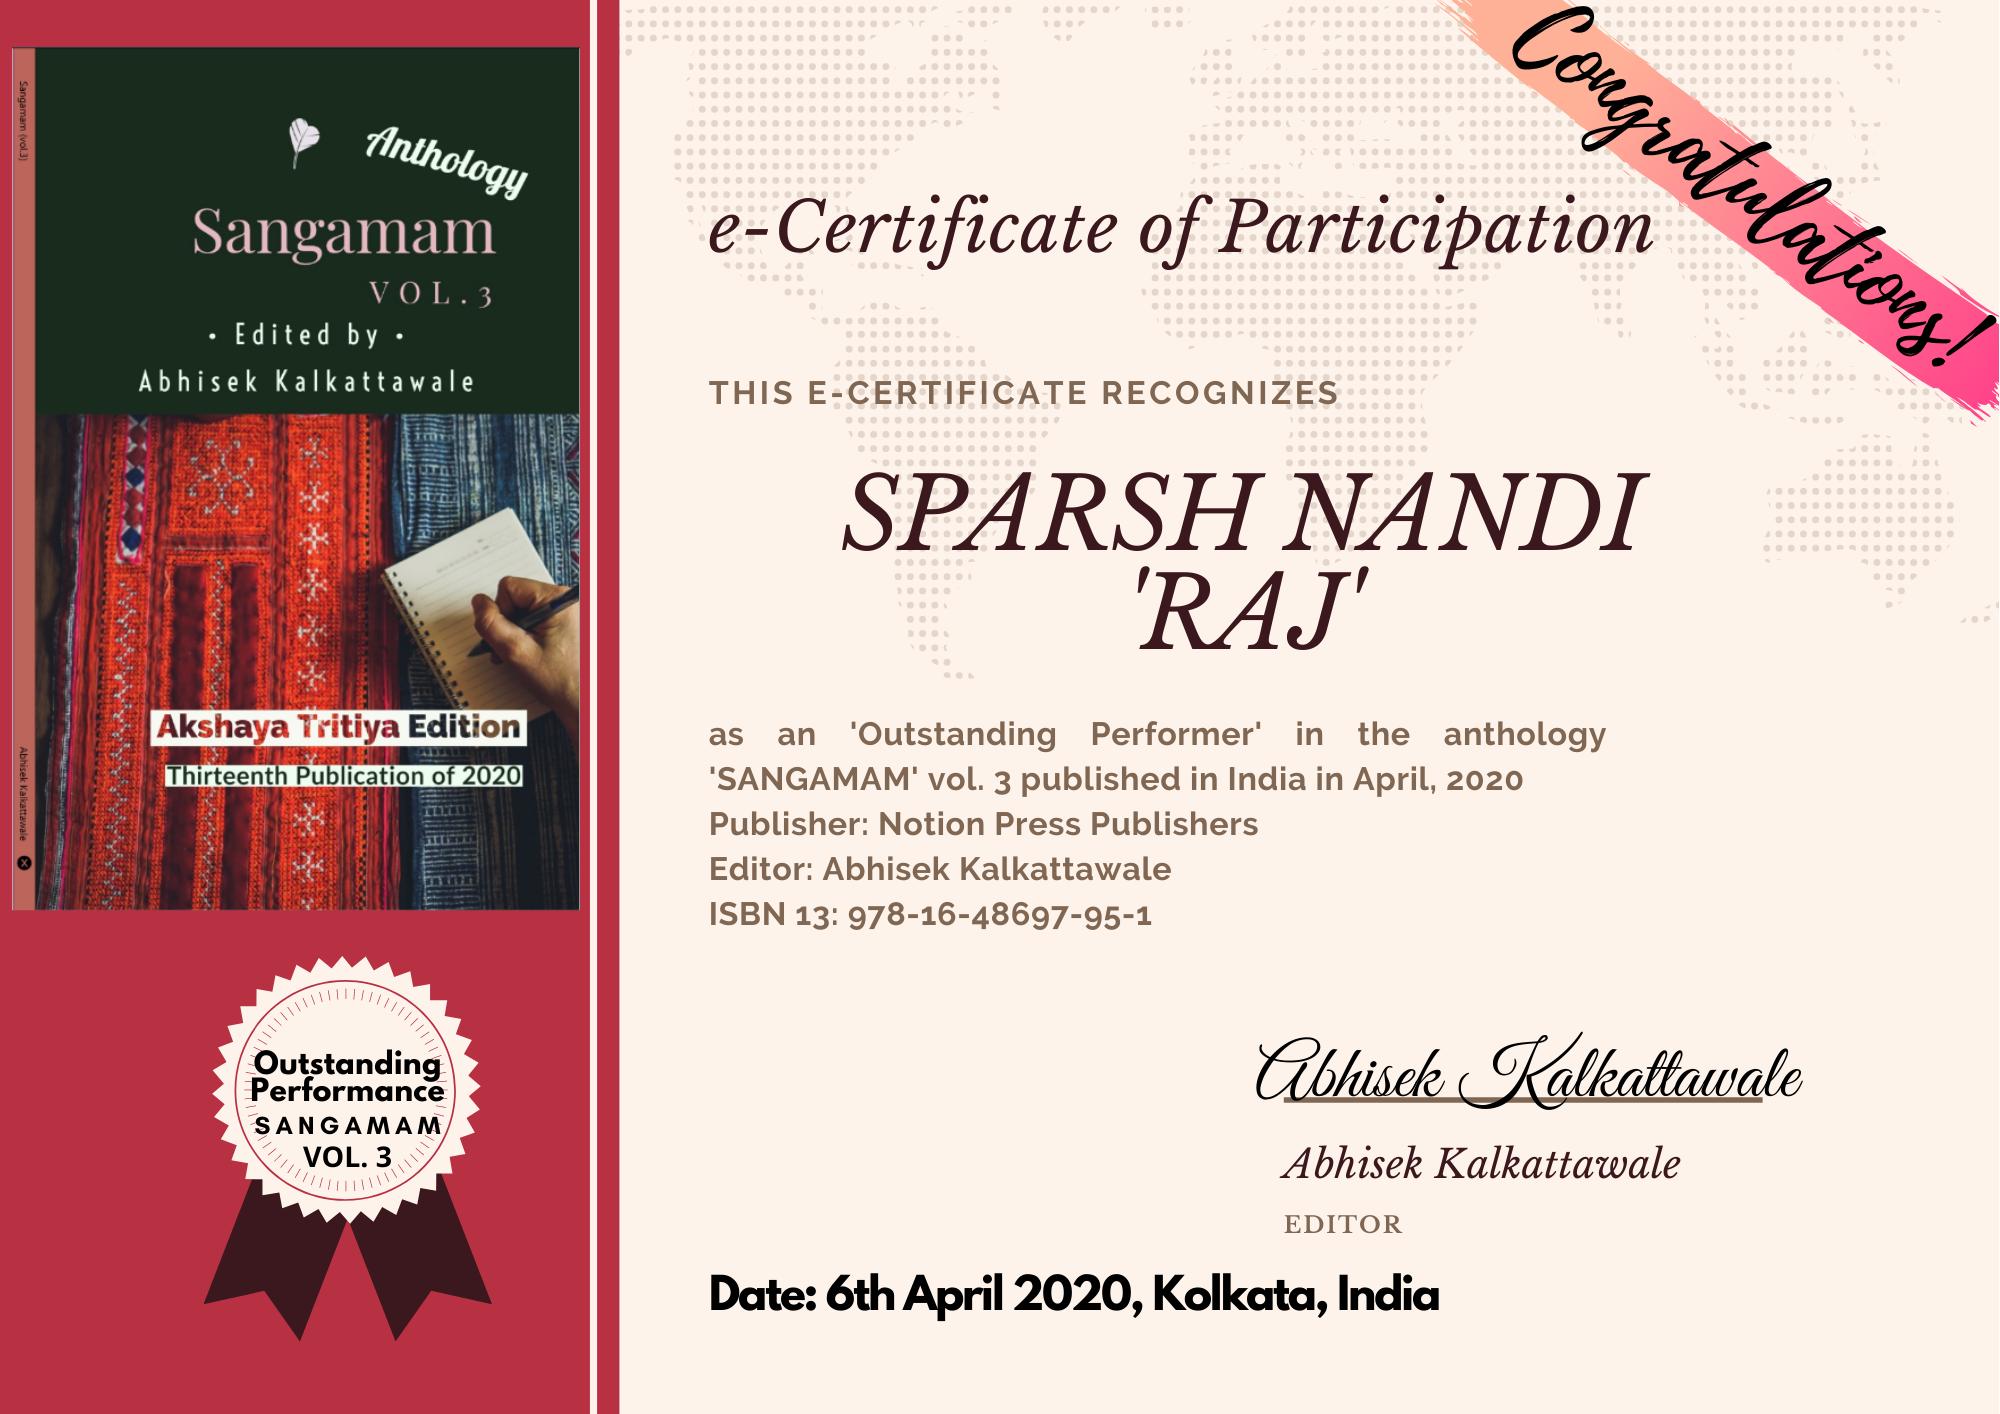 Sparsh Nandi